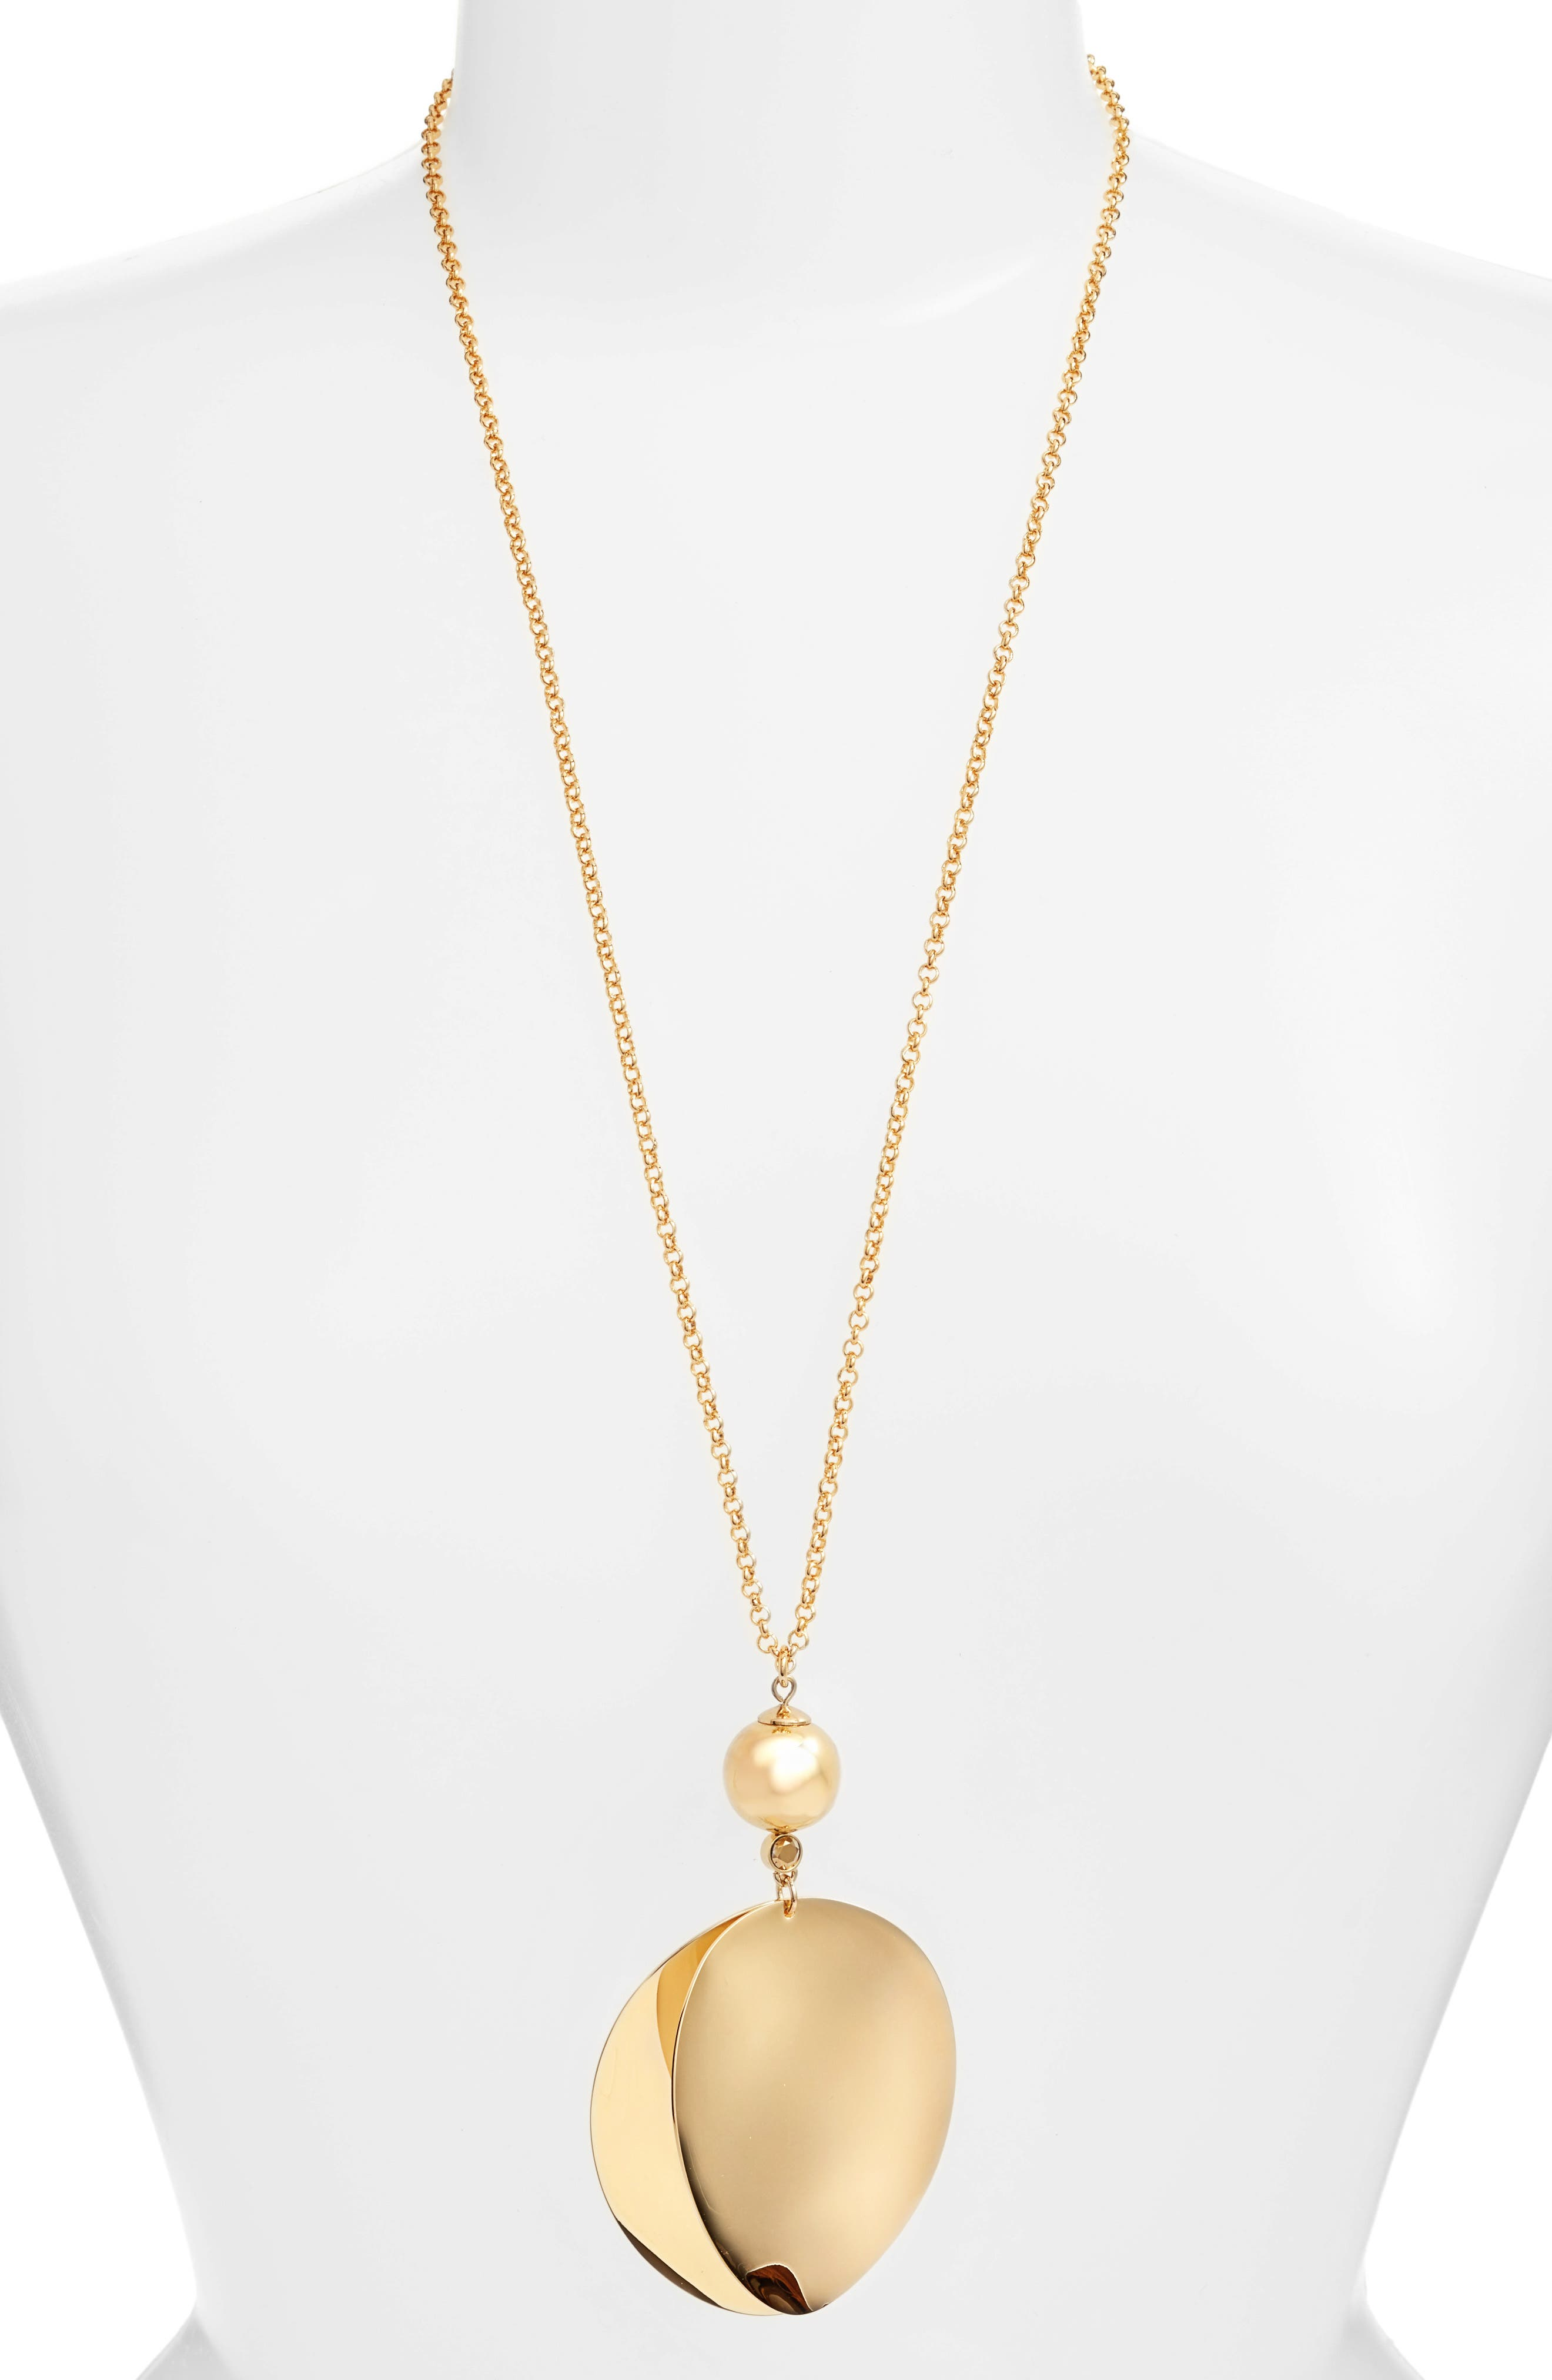 gold standard pendant necklace,                             Main thumbnail 1, color,                             711